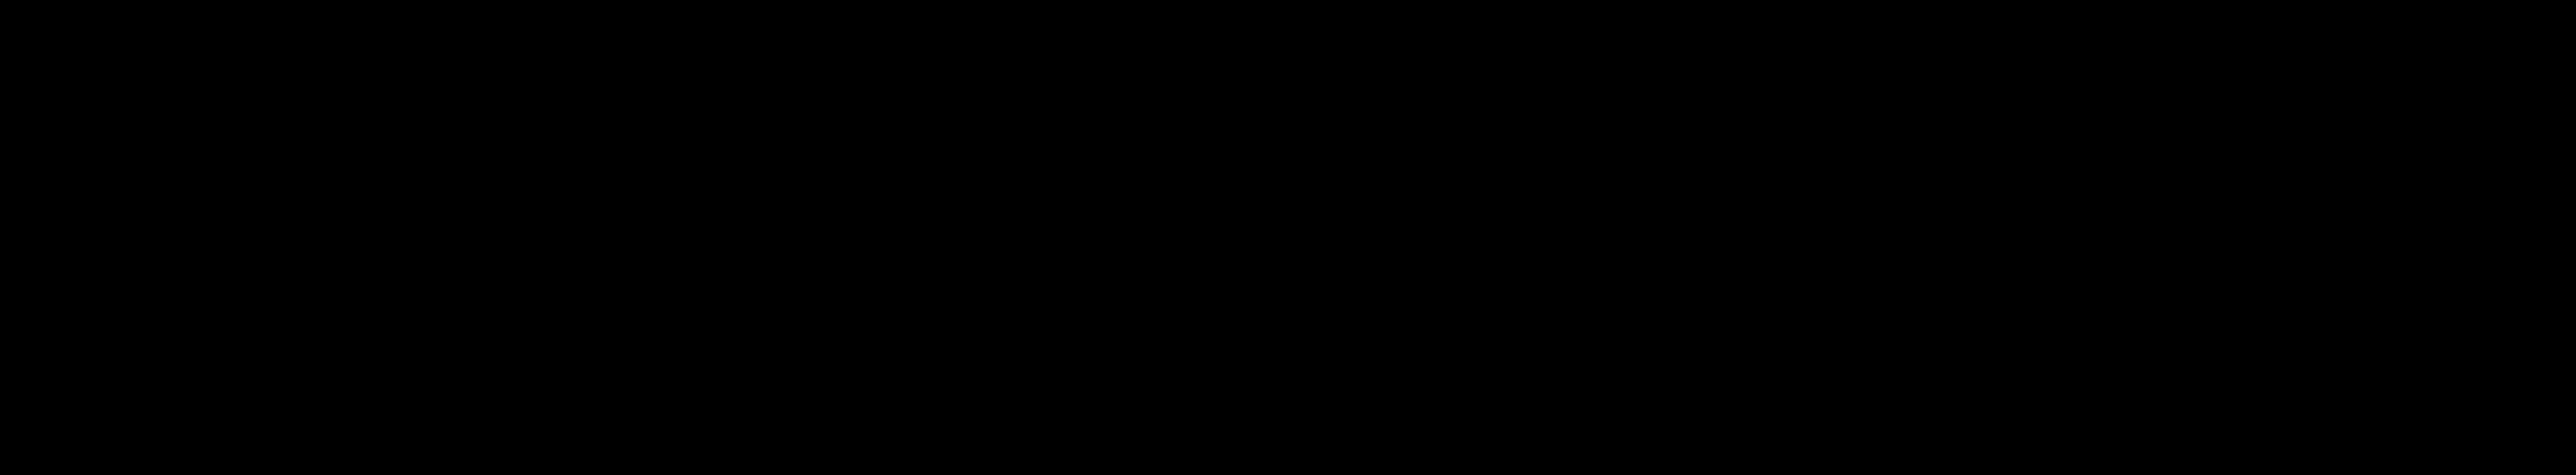 Nomura Holdings – Logos Download